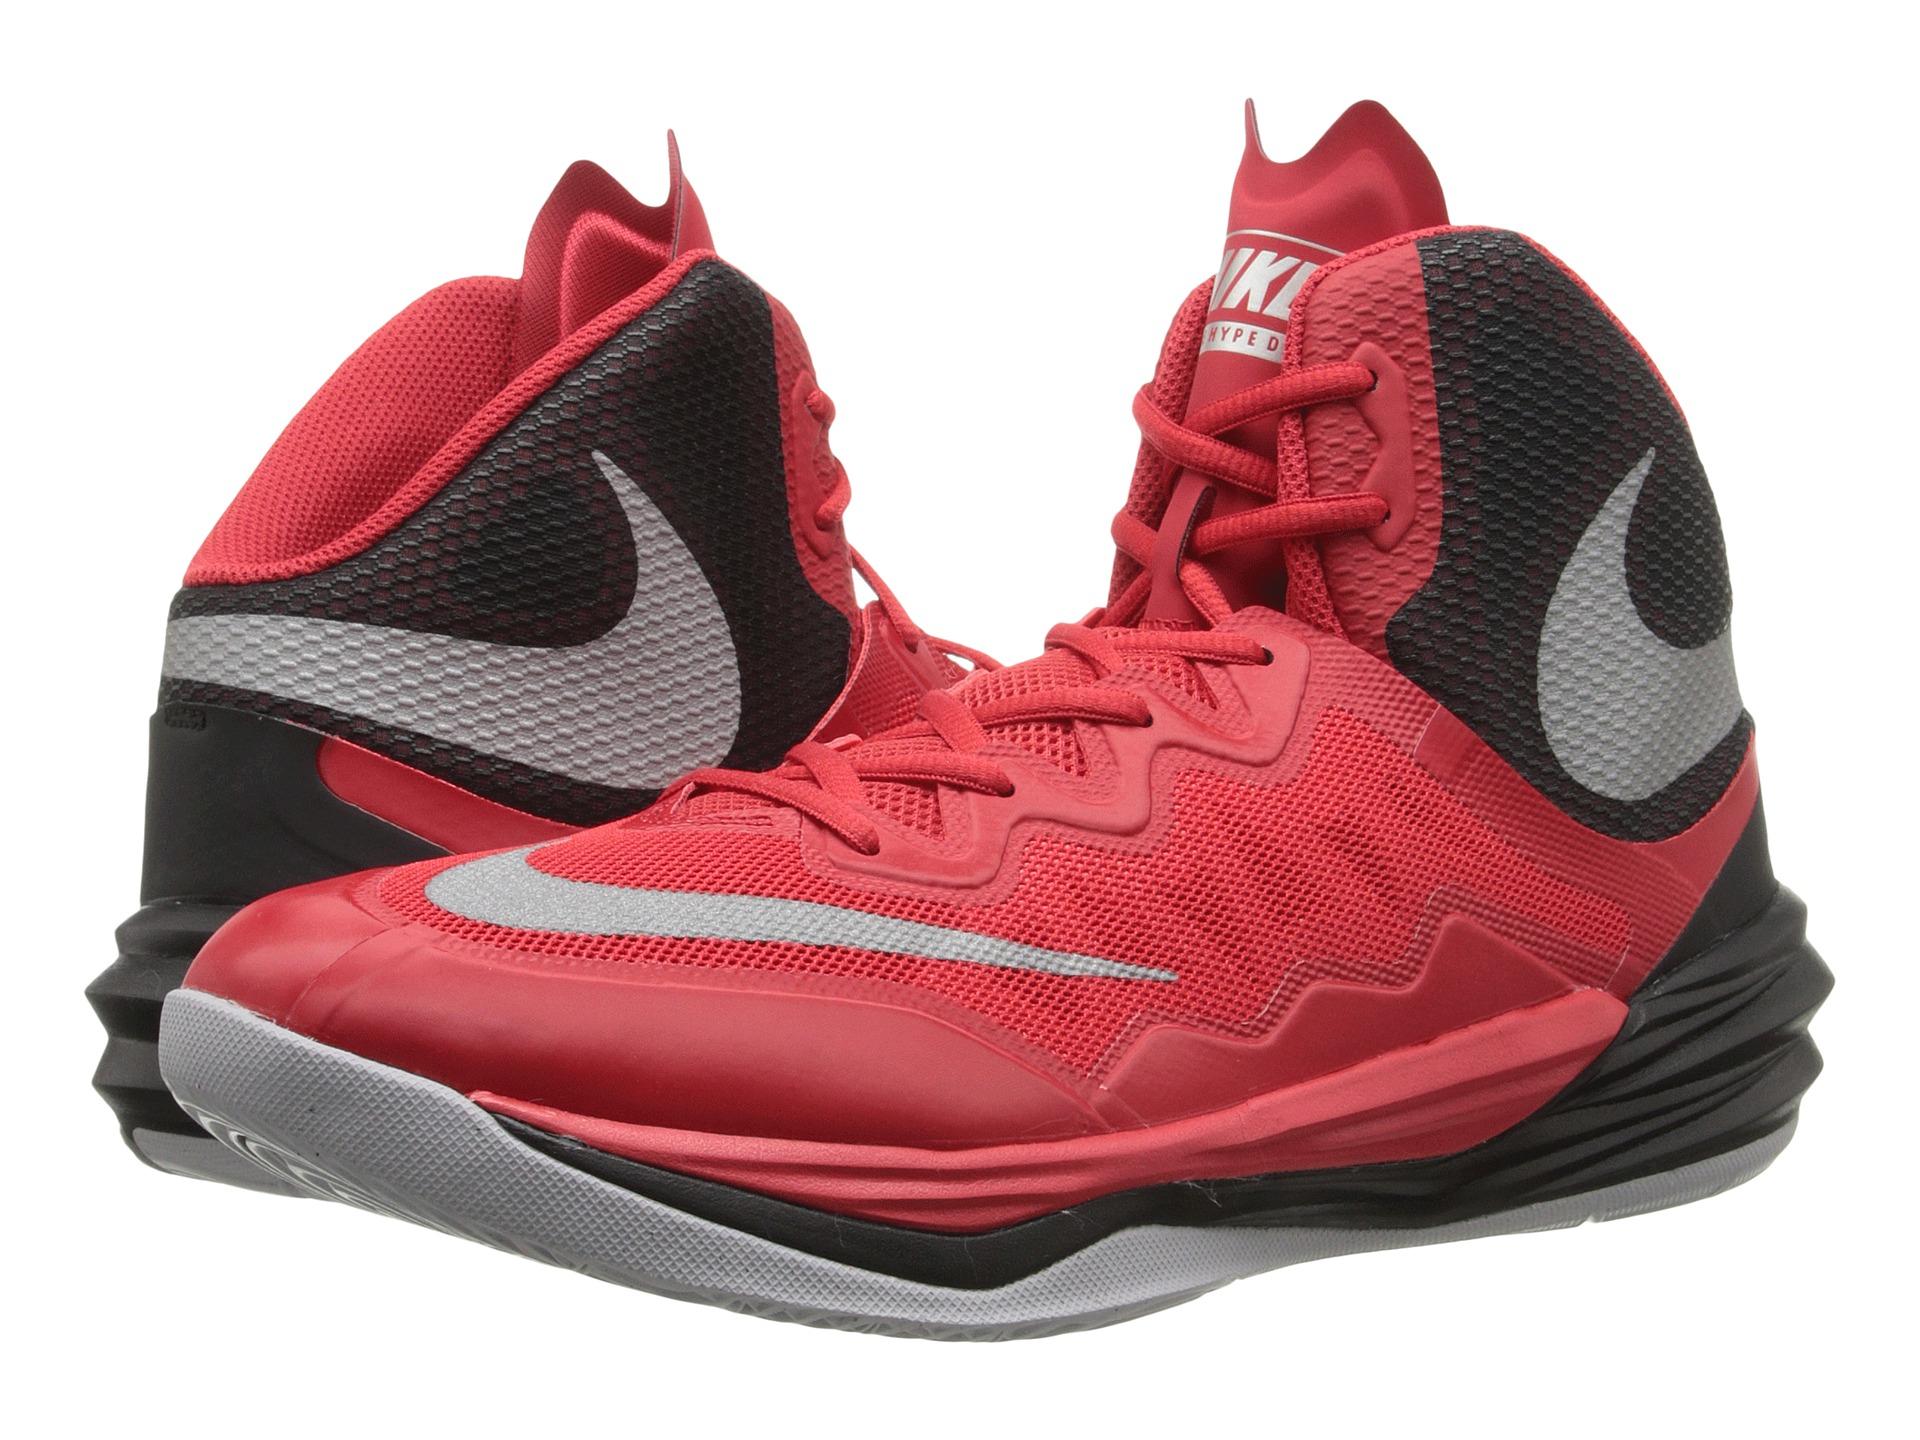 wholesale dealer c9381 24f88 Nike Red Prime Hype Df Ii for men